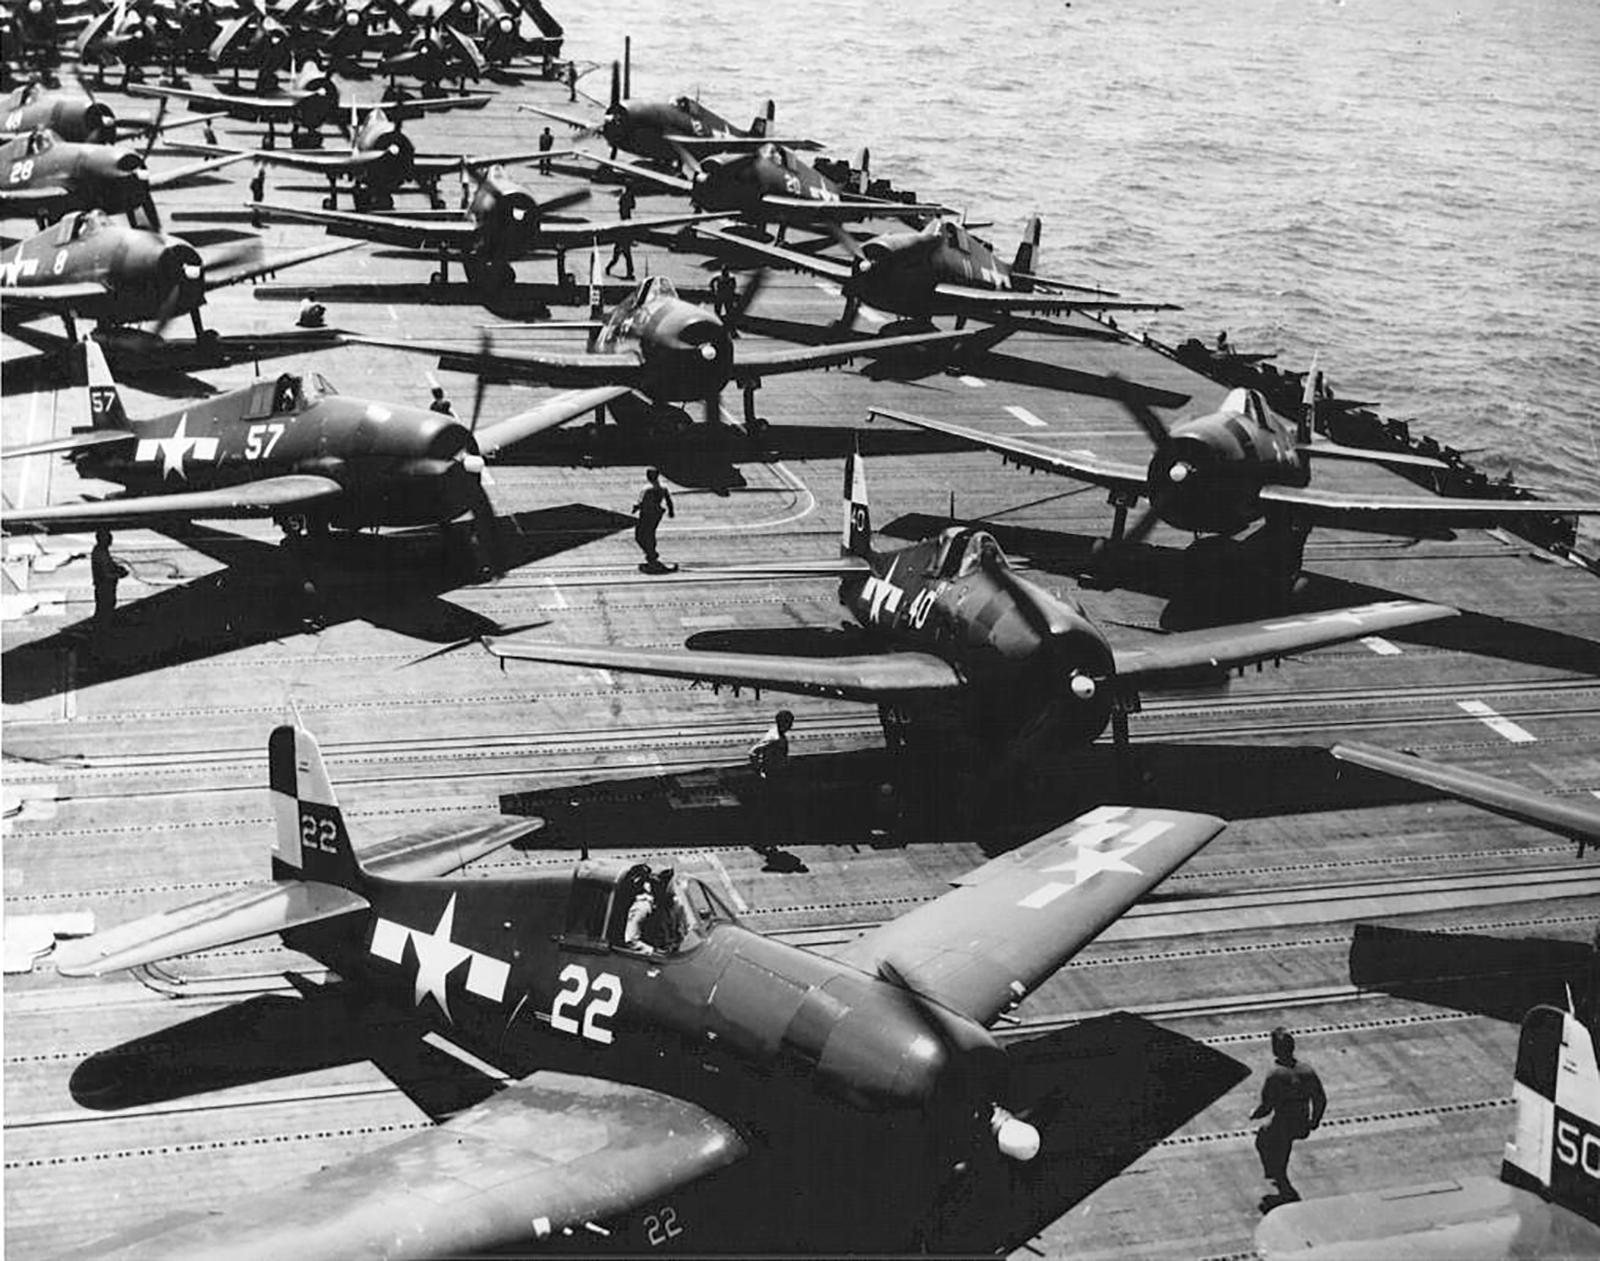 Grumman F6F 5 Hellcat VF 17 White 22 USS Hornet 1945 01